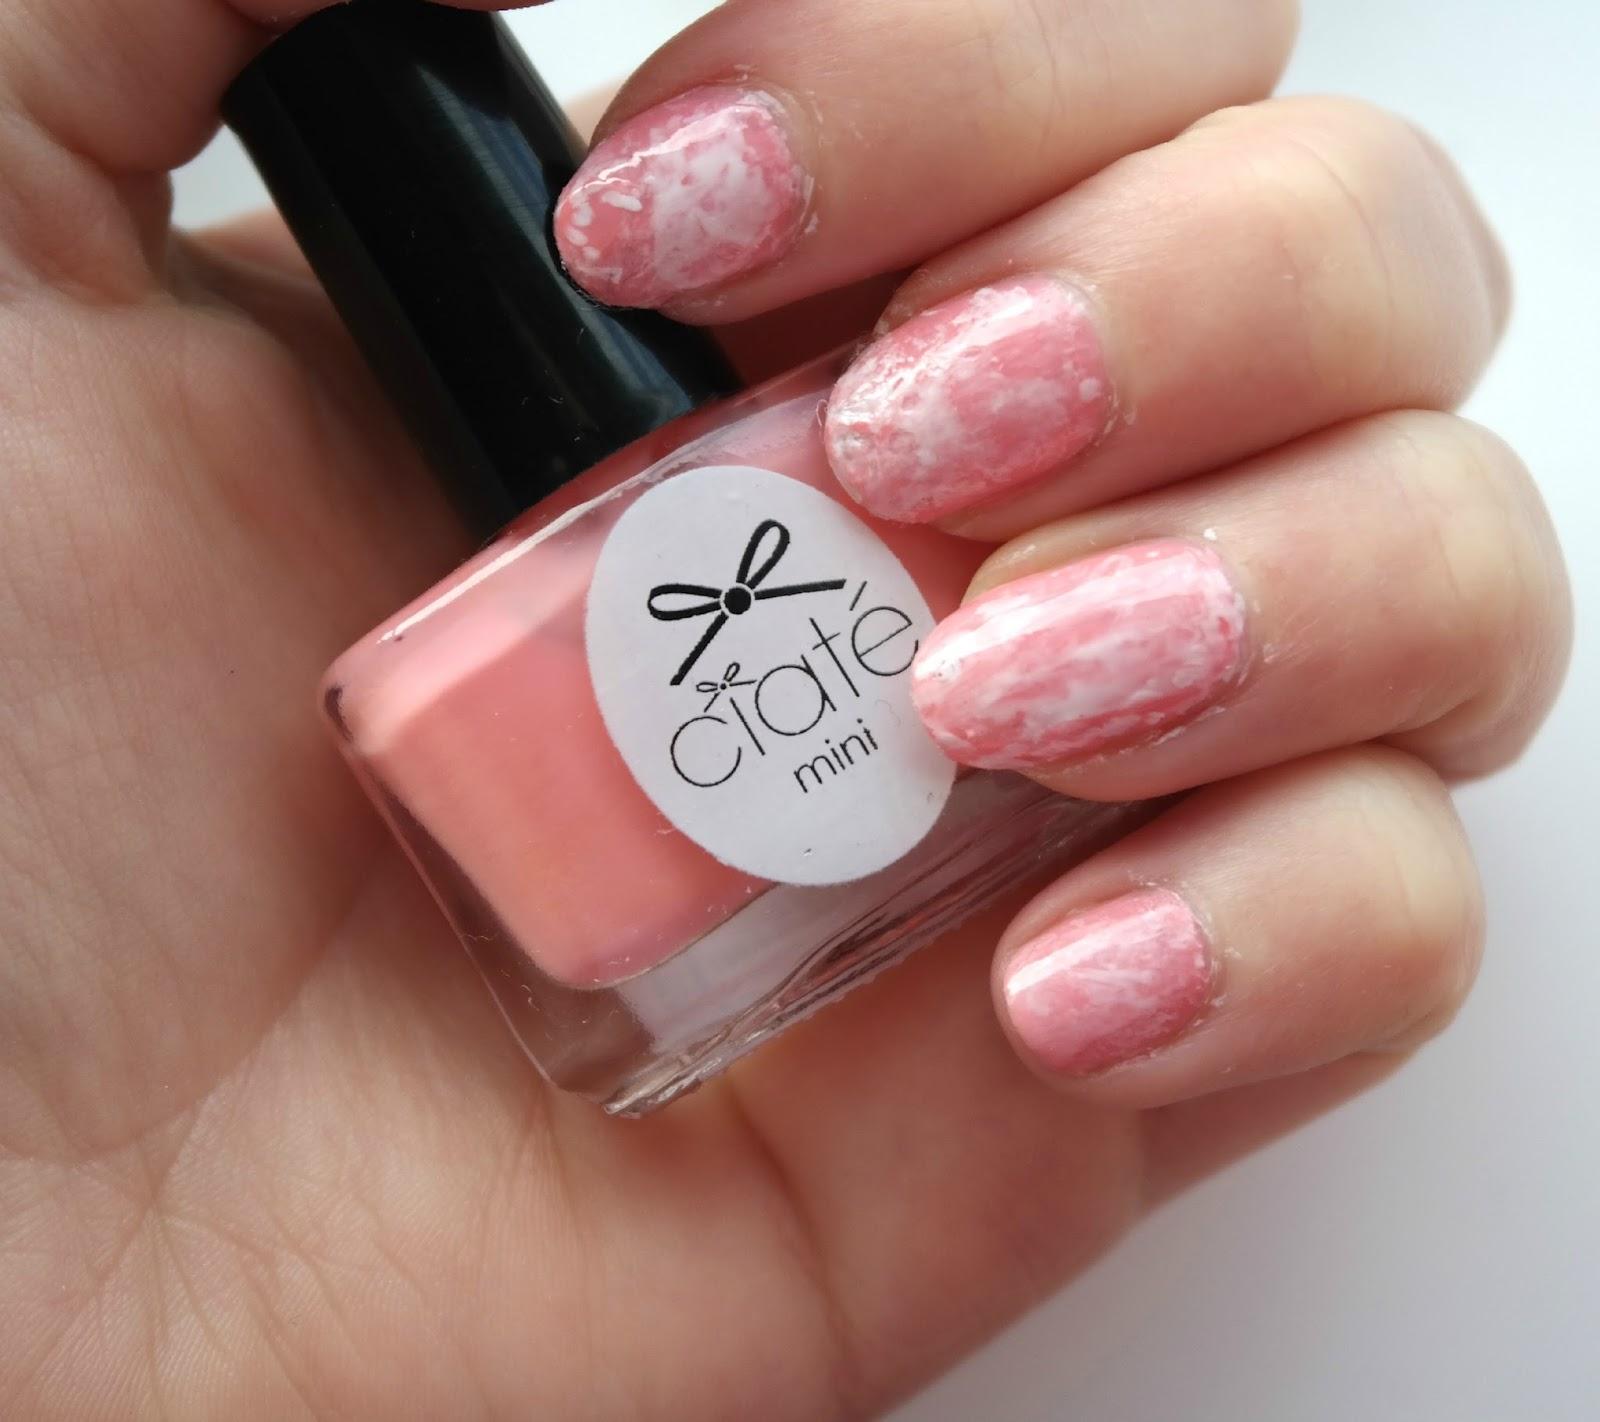 NOTD: Pink & White Marble Nails - Jenna Suth